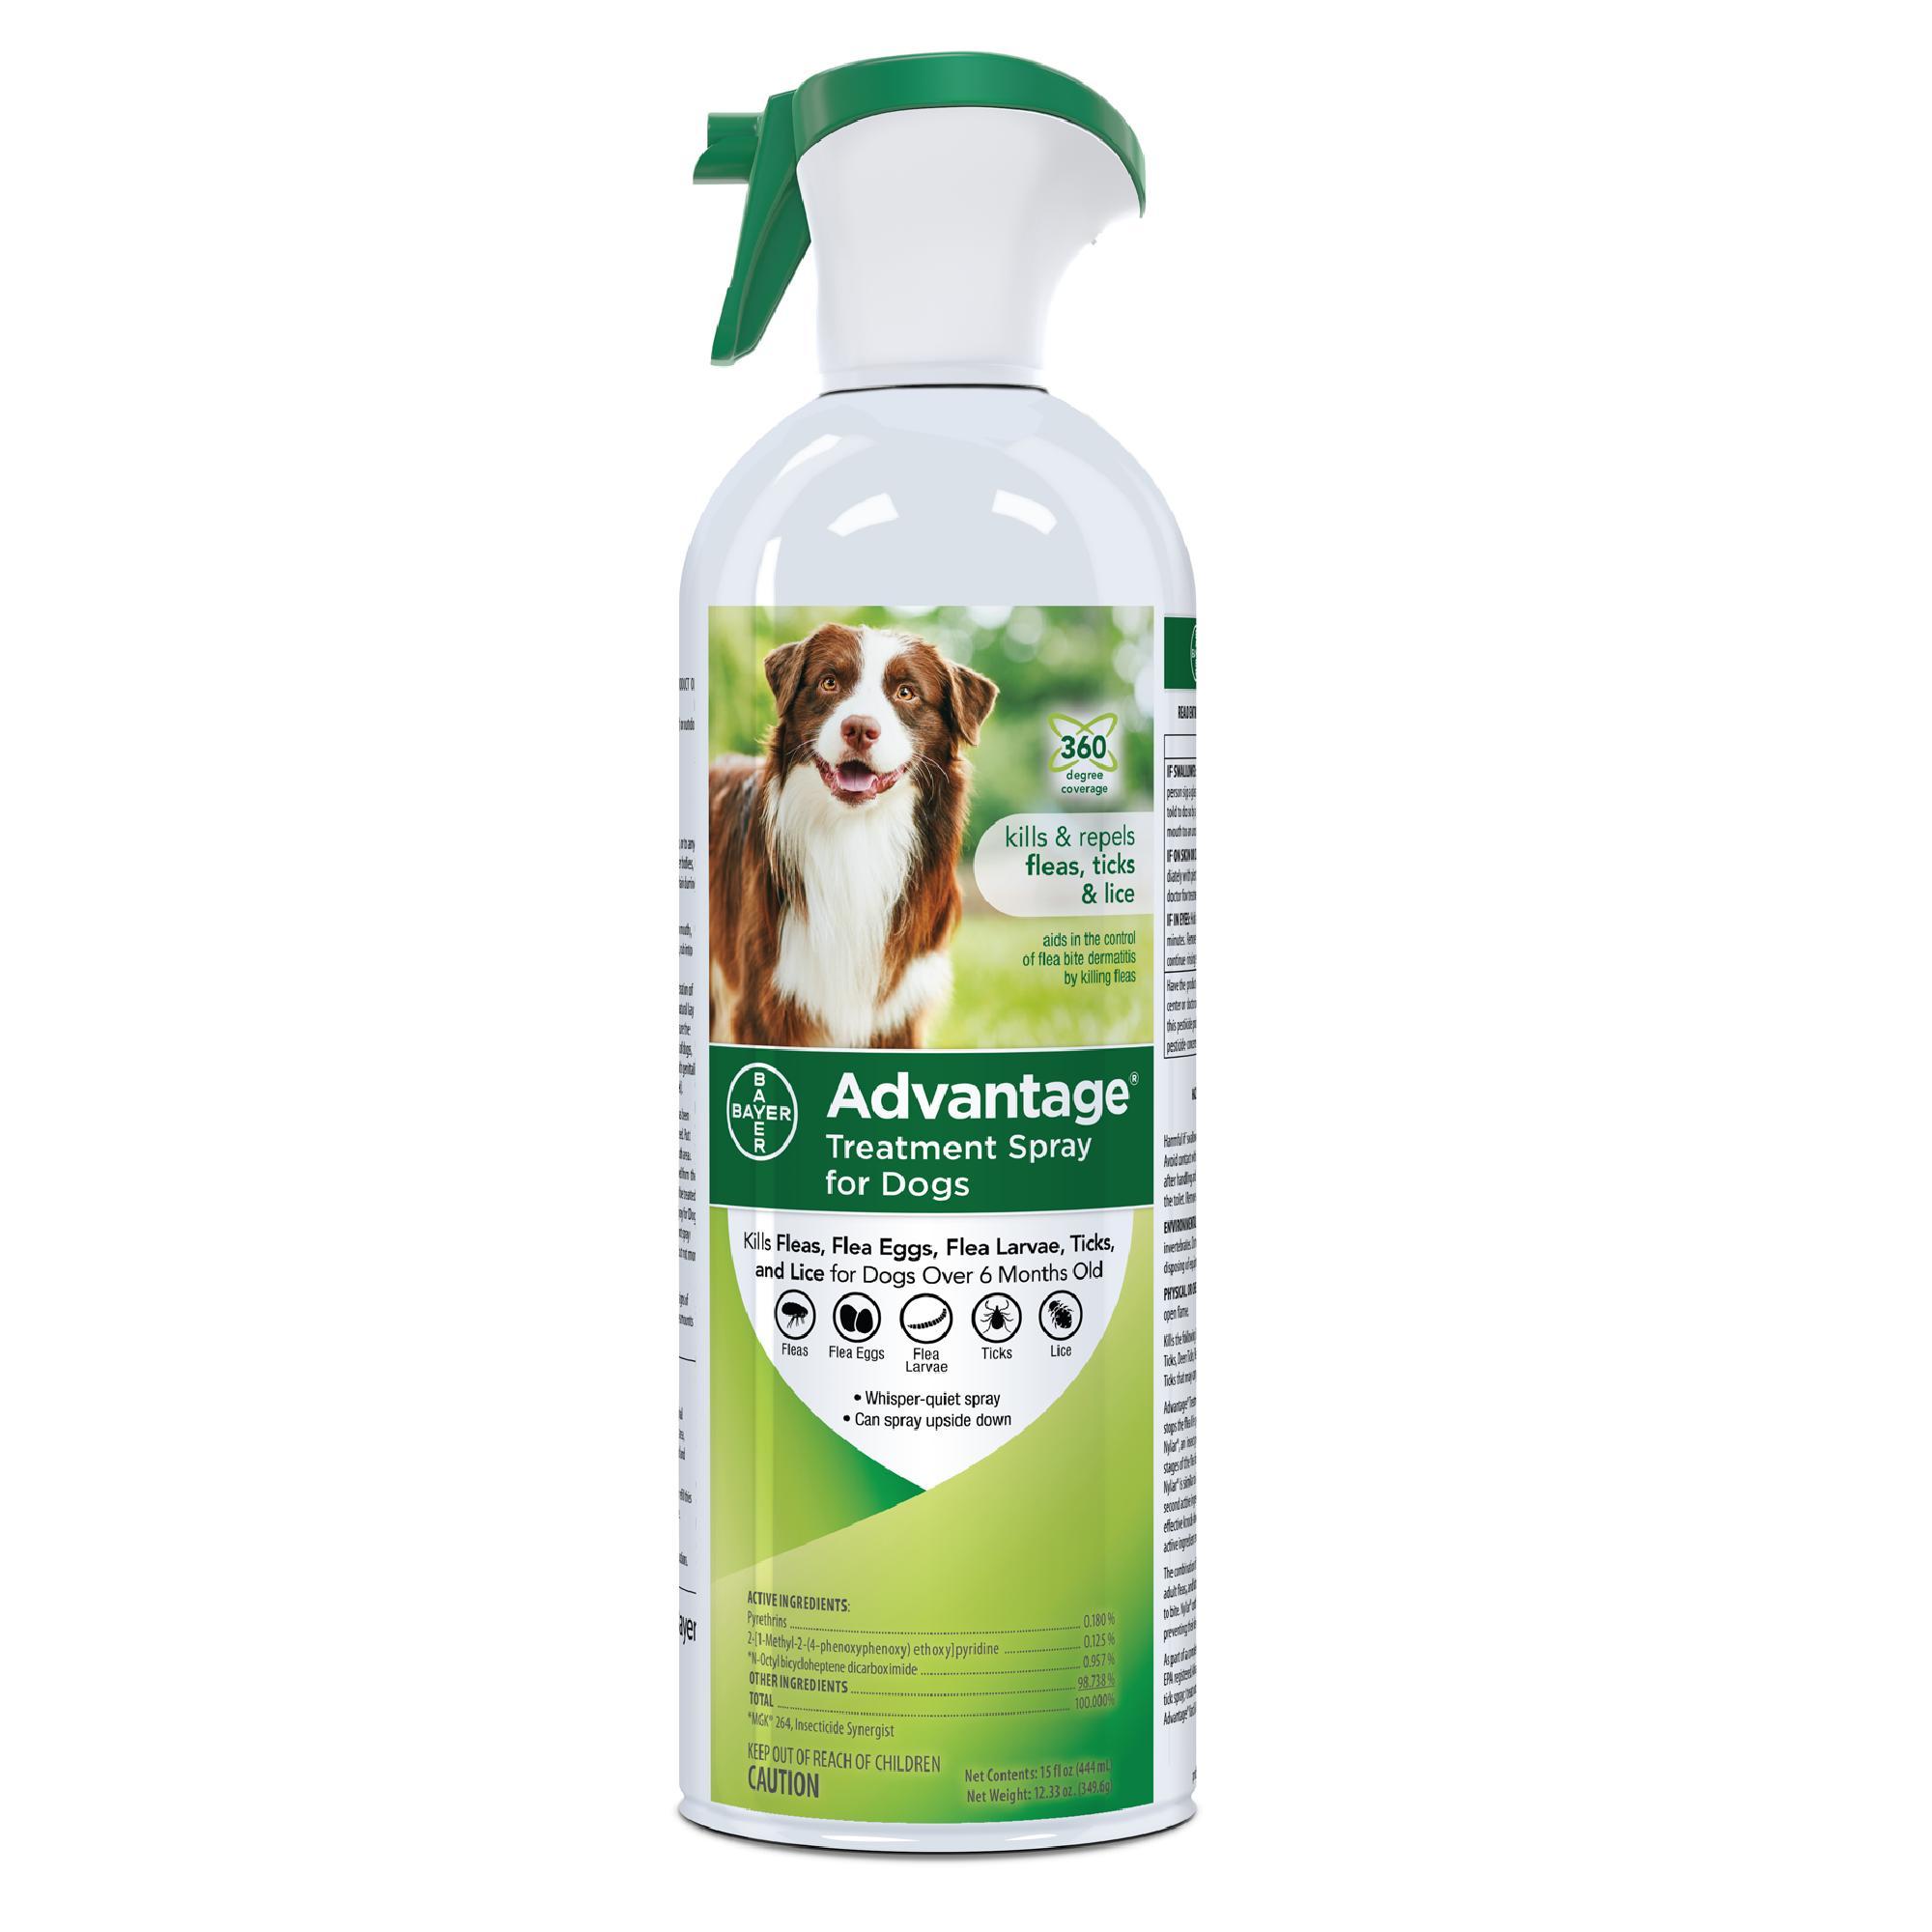 Advantage Flea & Tick Treatment Spray for Dogs, 15-oz